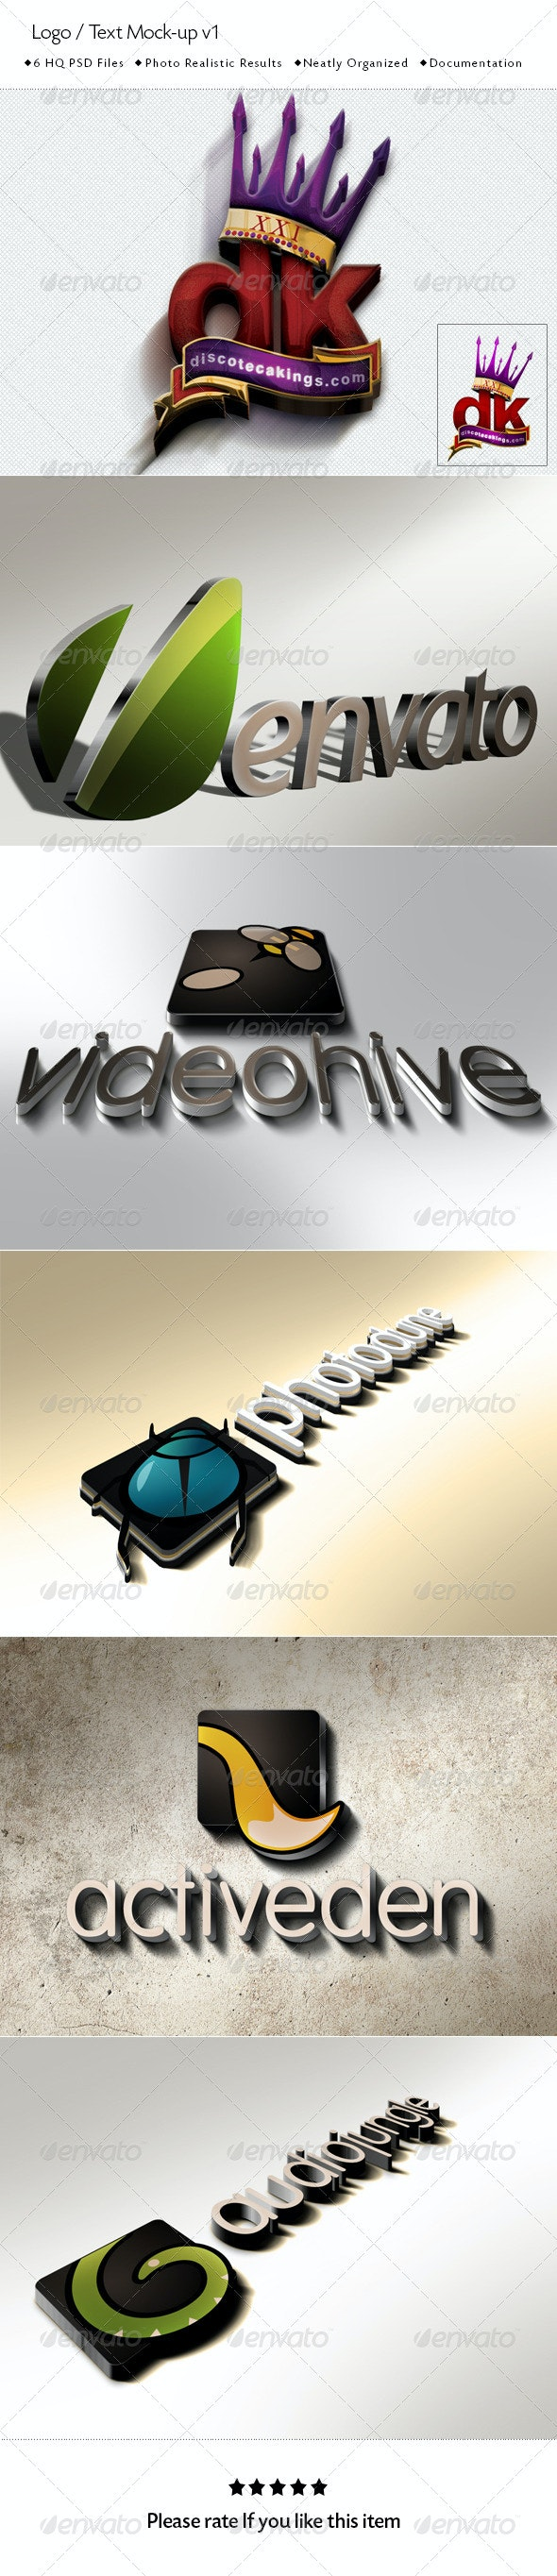 Logo / Text Mock-Up  - Logo Product Mock-Ups